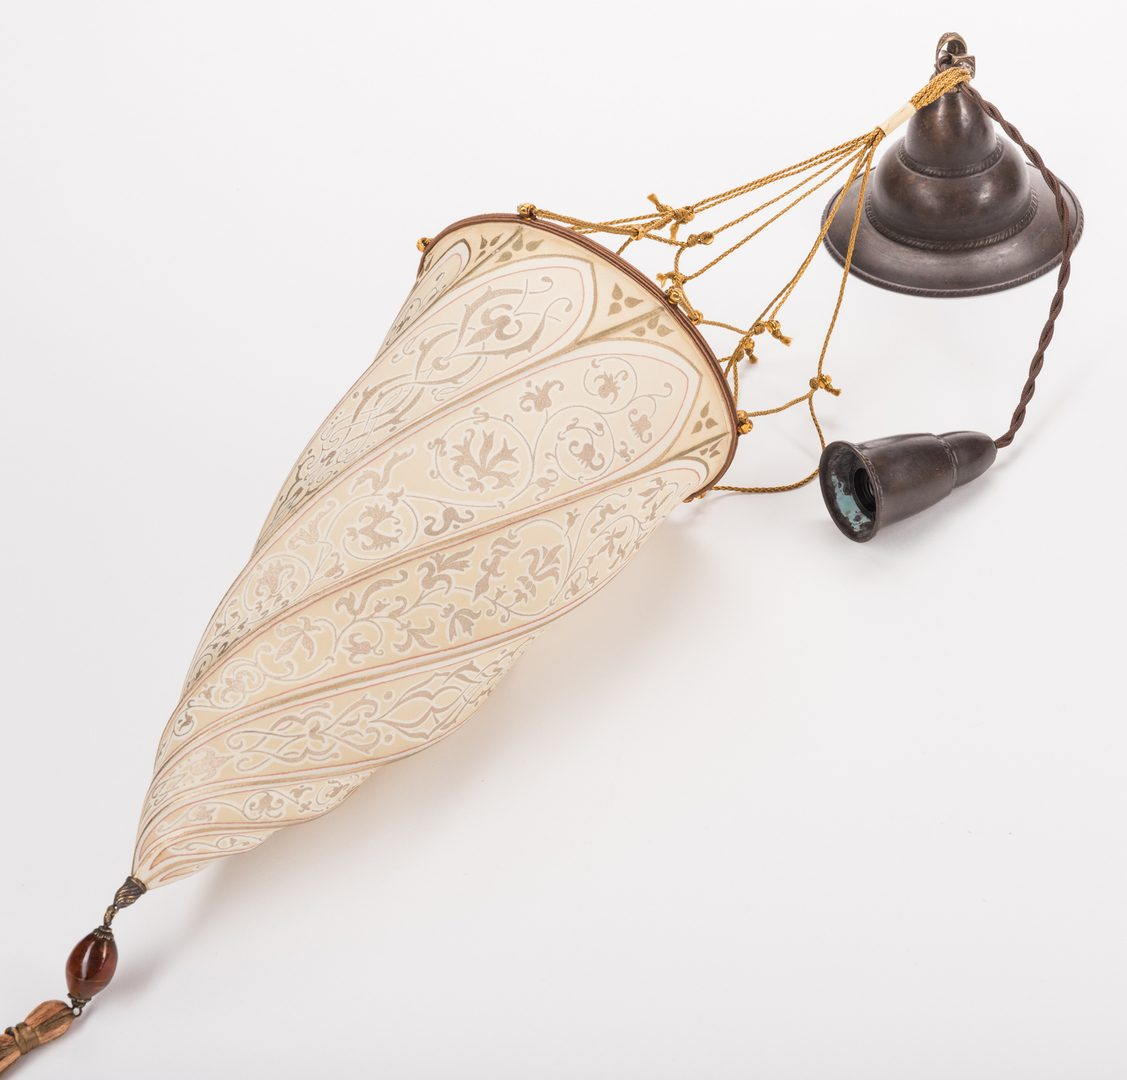 Lot 728: Venetia Studium 'Cesendello' Floor Lamp & Wall Sconces, 3 items